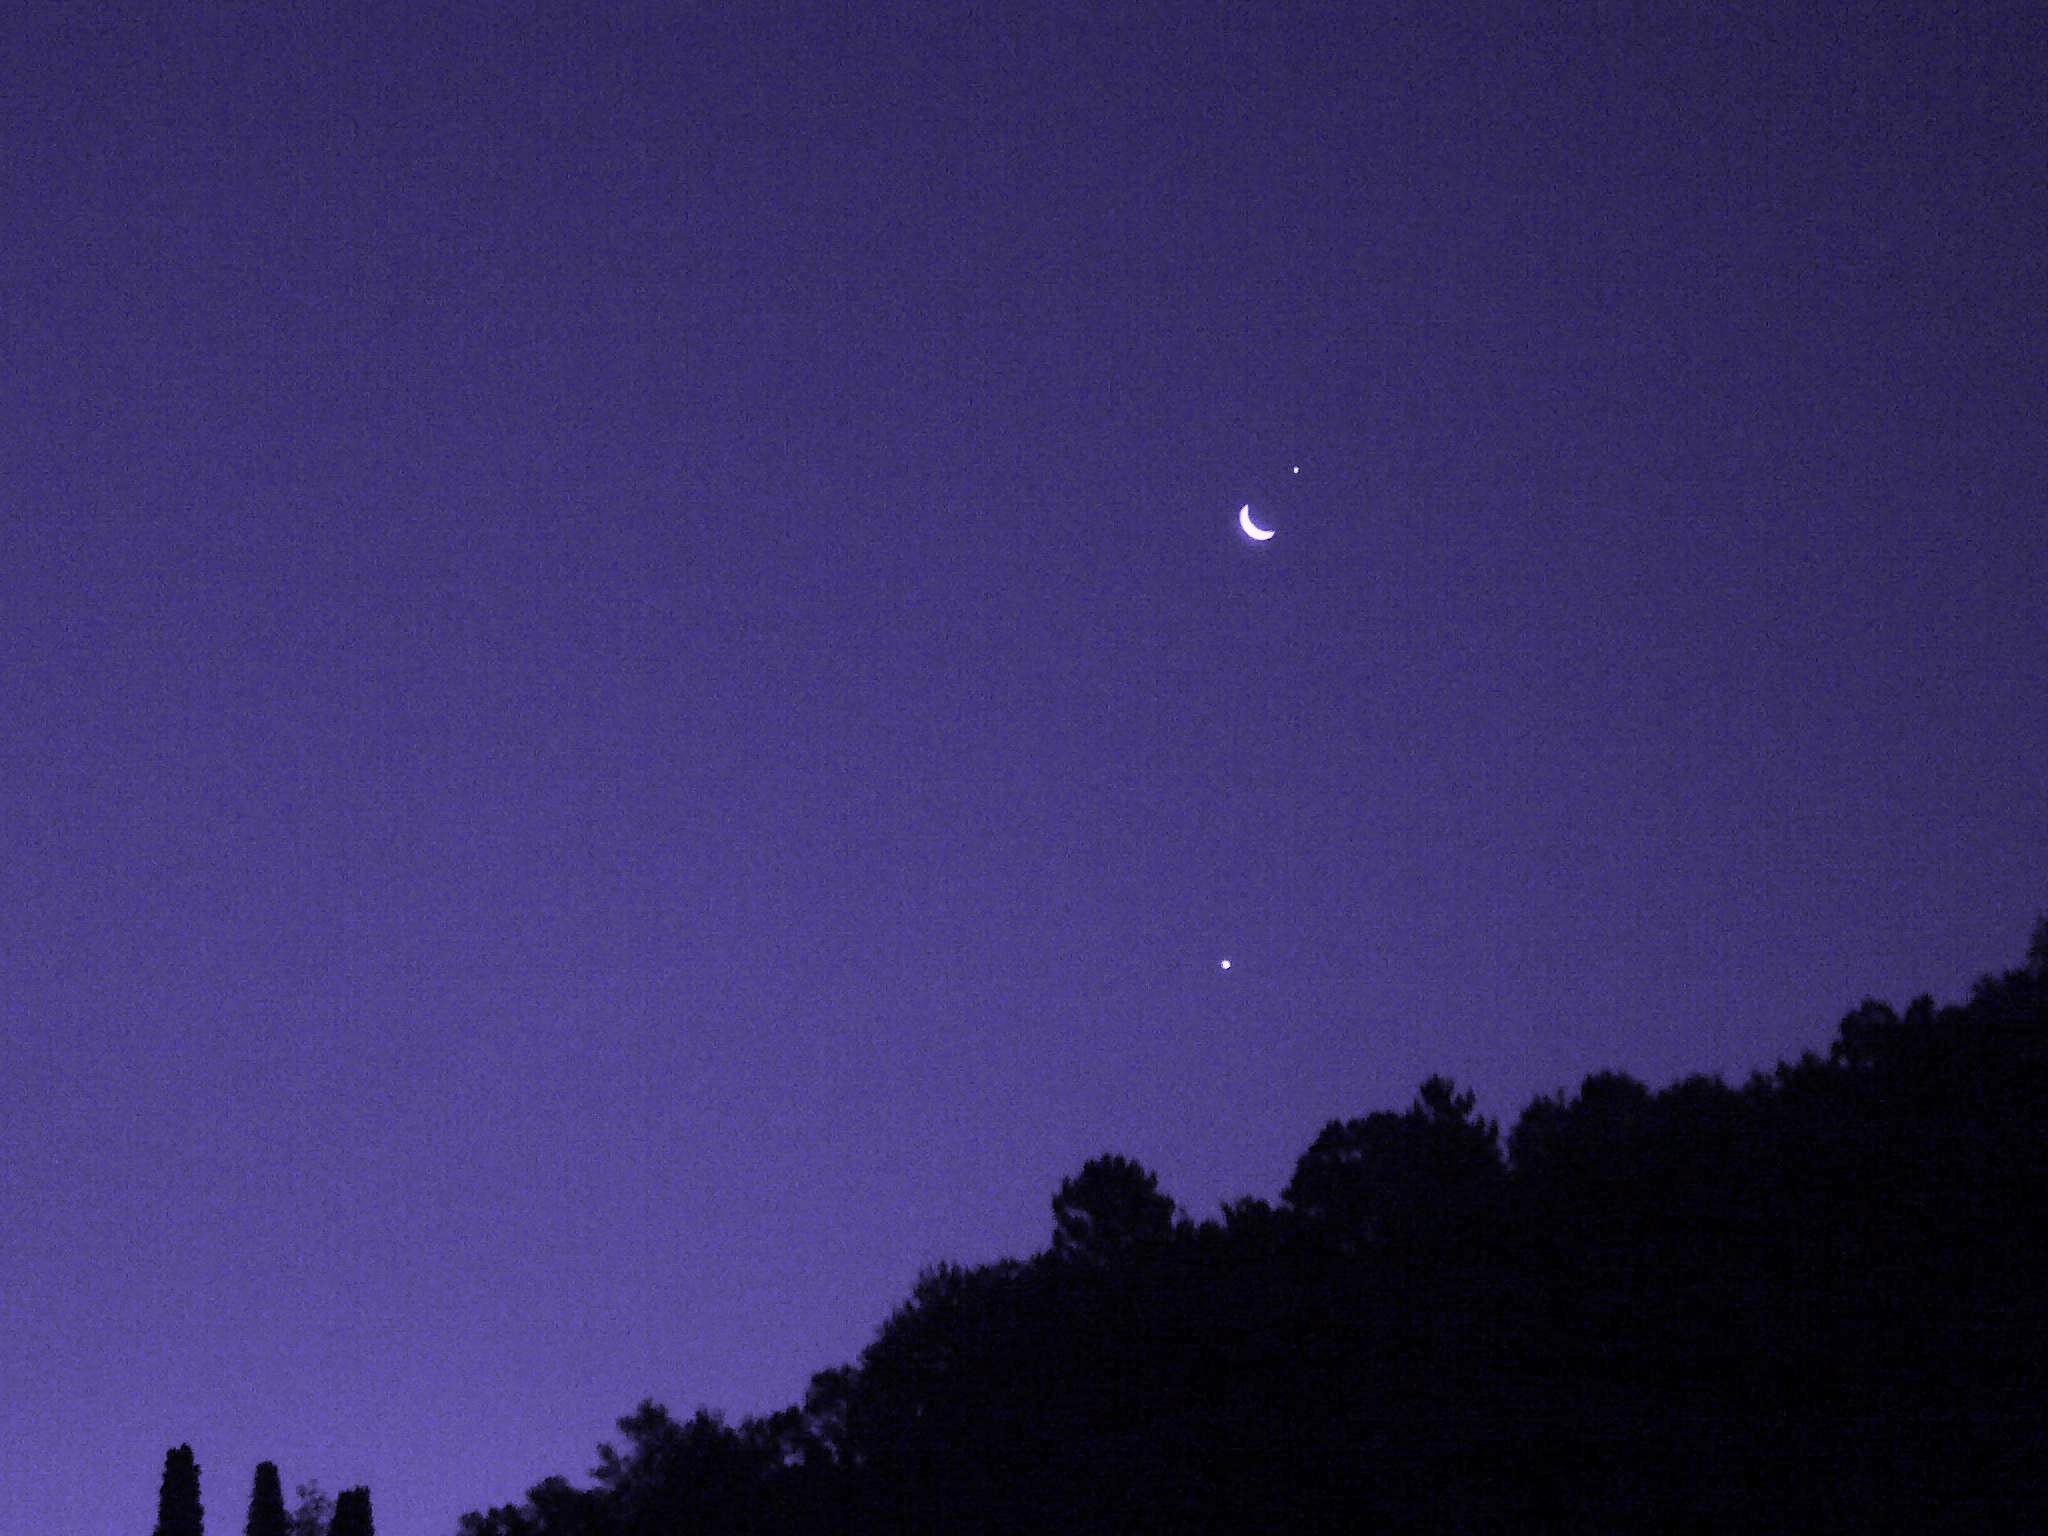 File:Moon Venus Jupiter Conjunction jpg - Wikimedia Commons